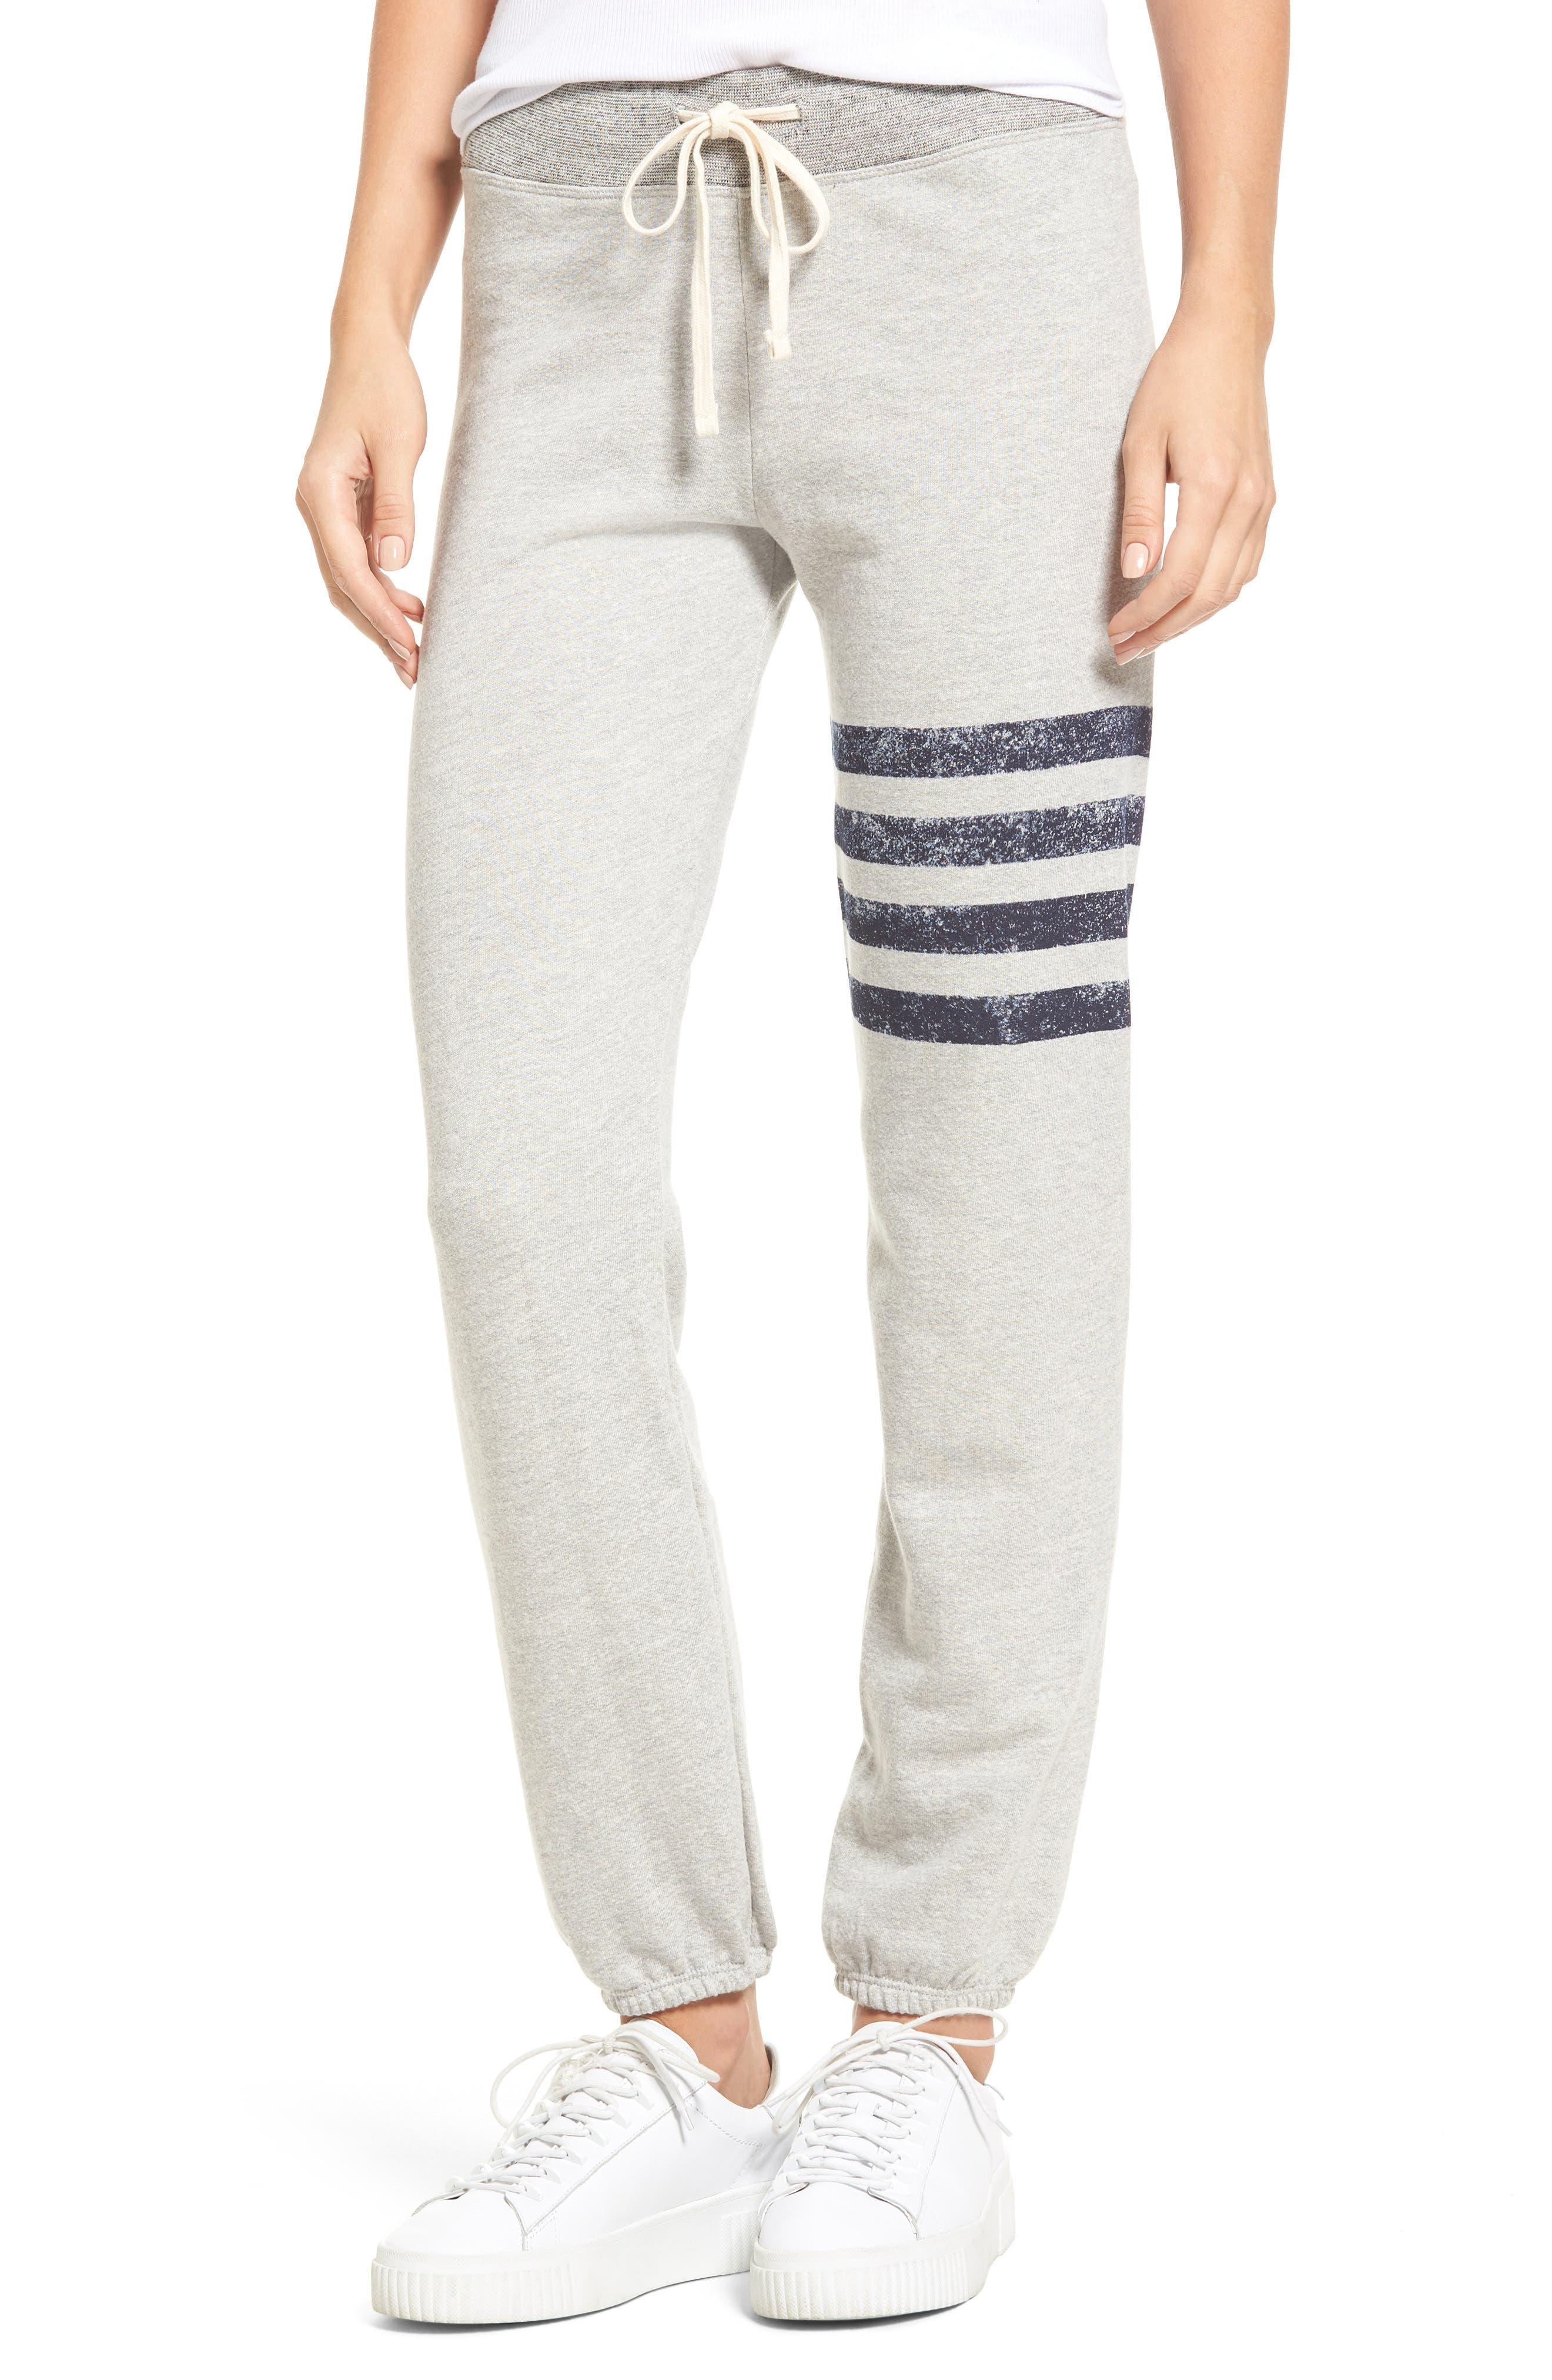 Stripe Yoga Pants,                         Main,                         color, 001